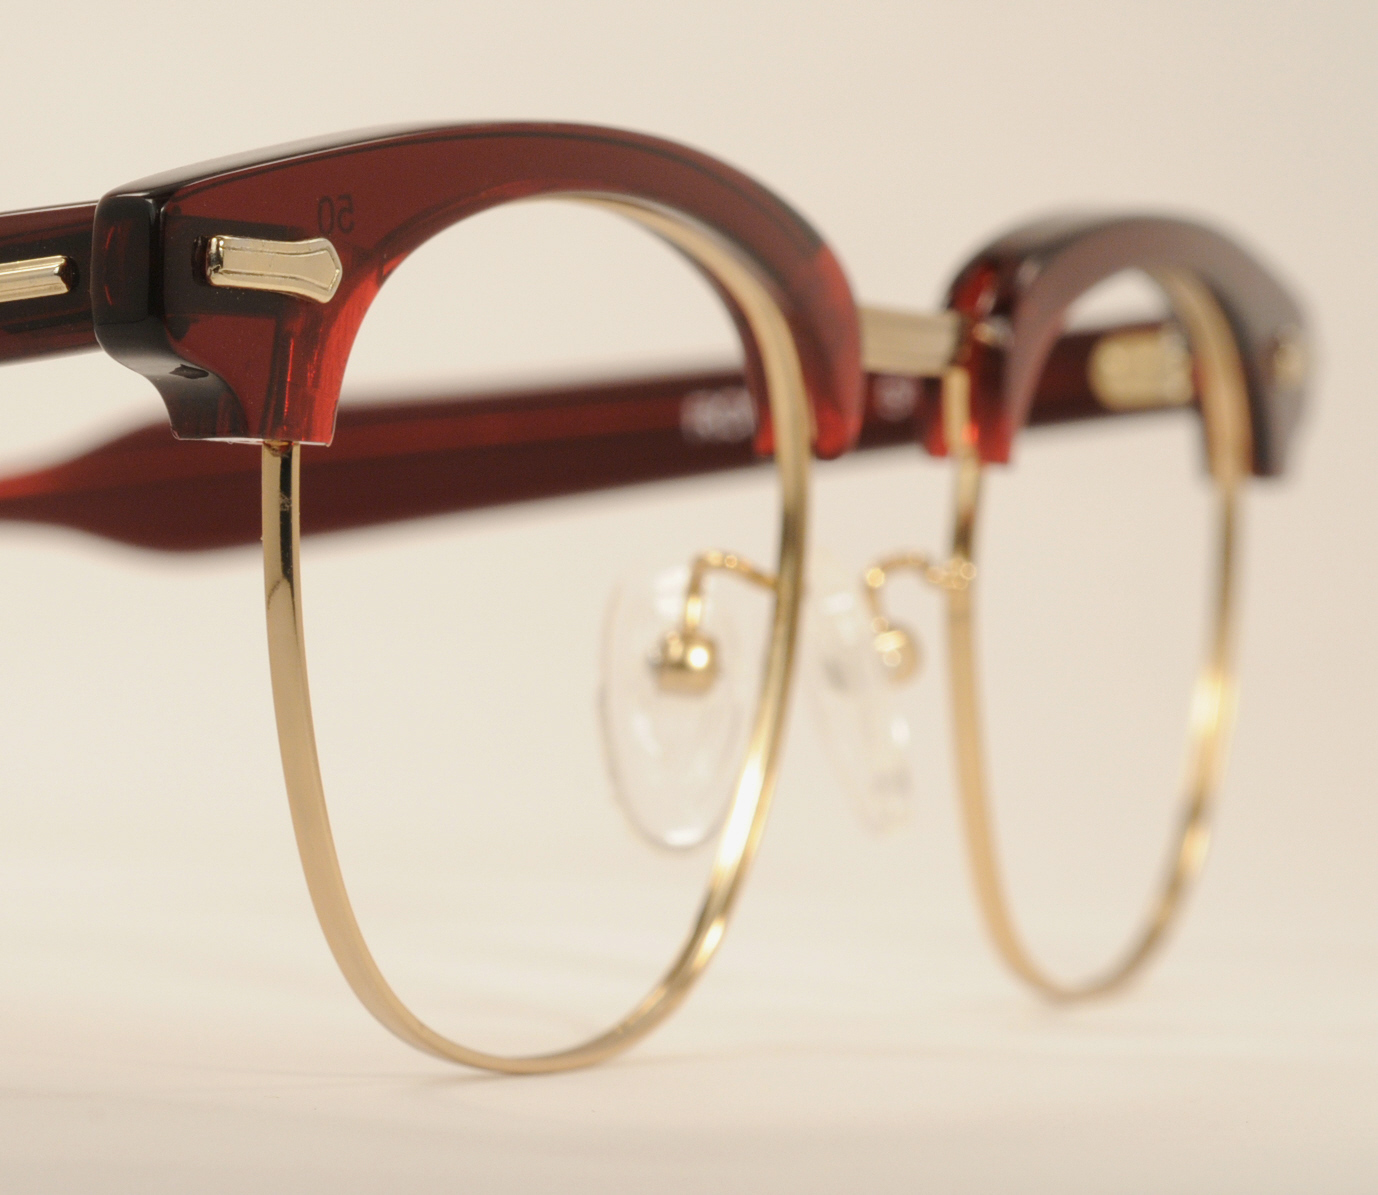 Zyl Eyeglass Frames : Optometrist Attic - SHURON RONSIR ZYL G-MAN CORDOVA ...